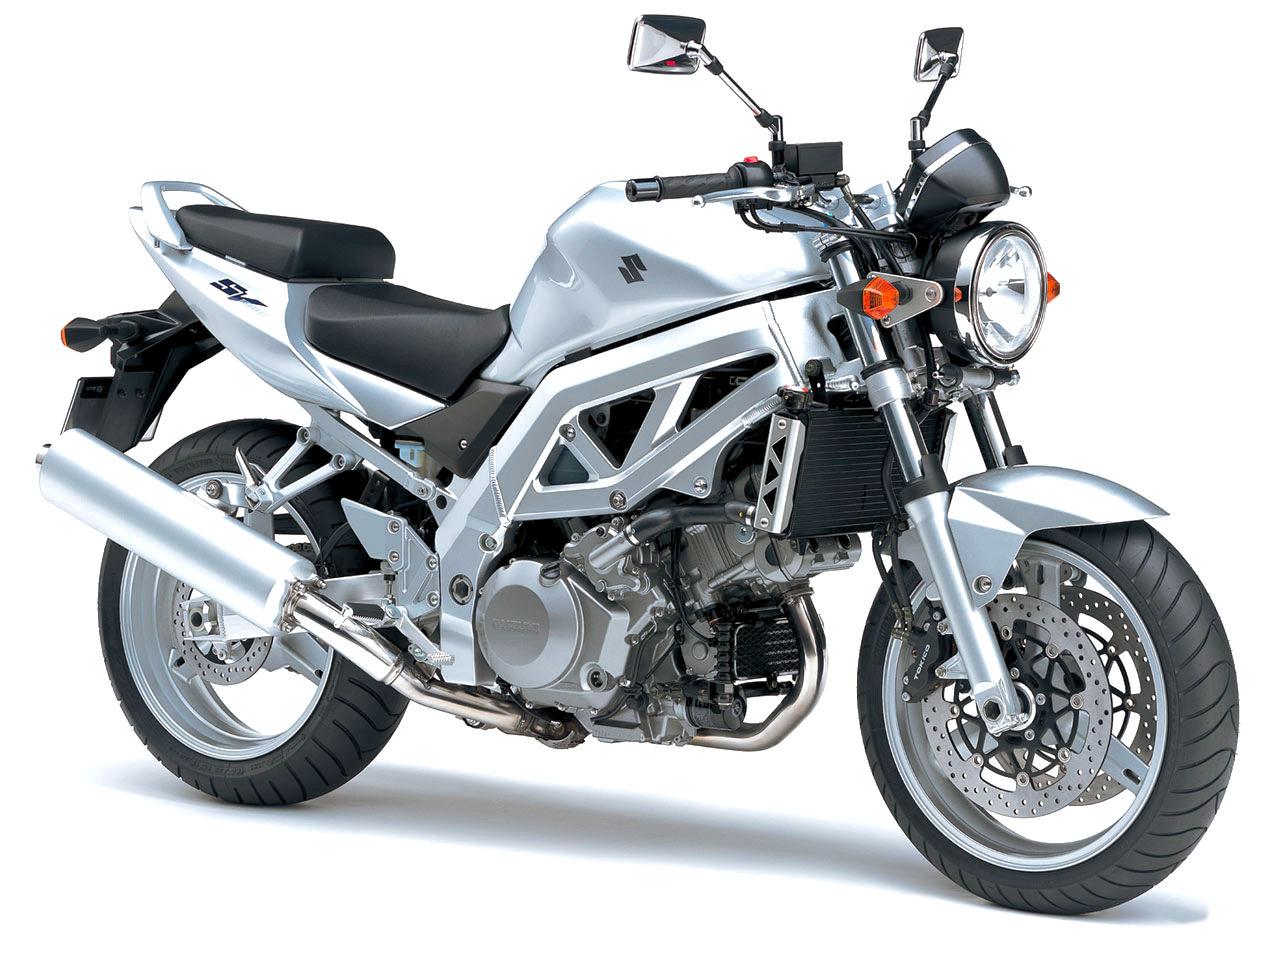 http://2.bp.blogspot.com/-7HNKMosqF3s/Tjp3_h9wxfI/AAAAAAAAEVo/cboMRQ43rtk/s1600/Suzuki++SV+1000.jpg